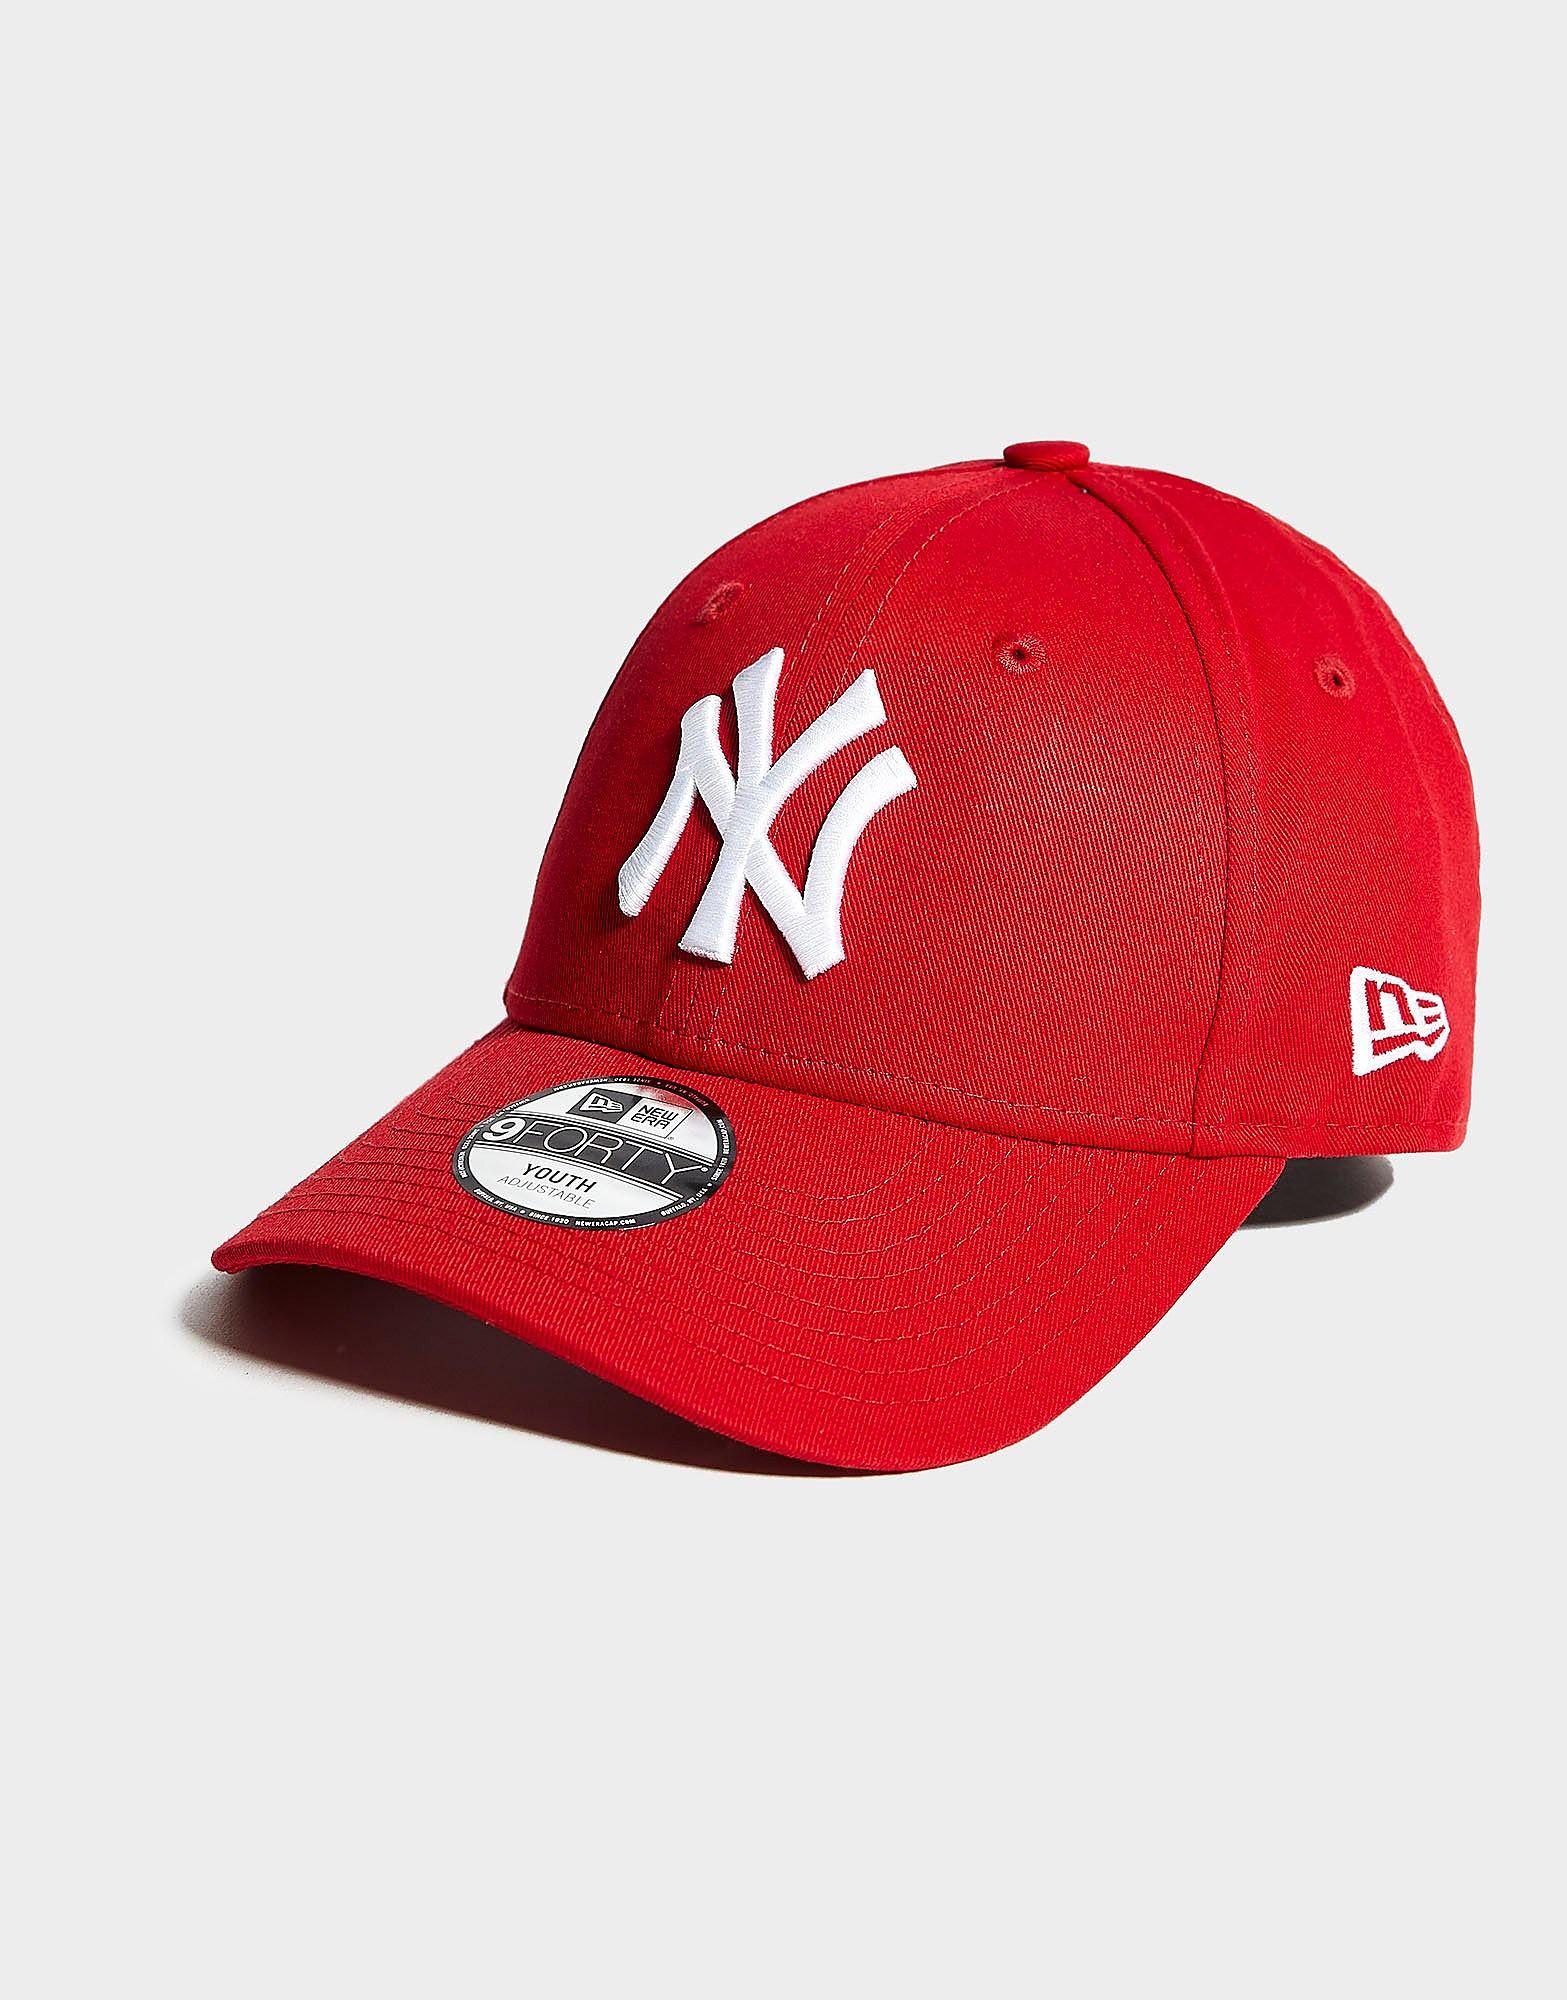 New Era 9FORTY MLB New York Yankees-kinderpet